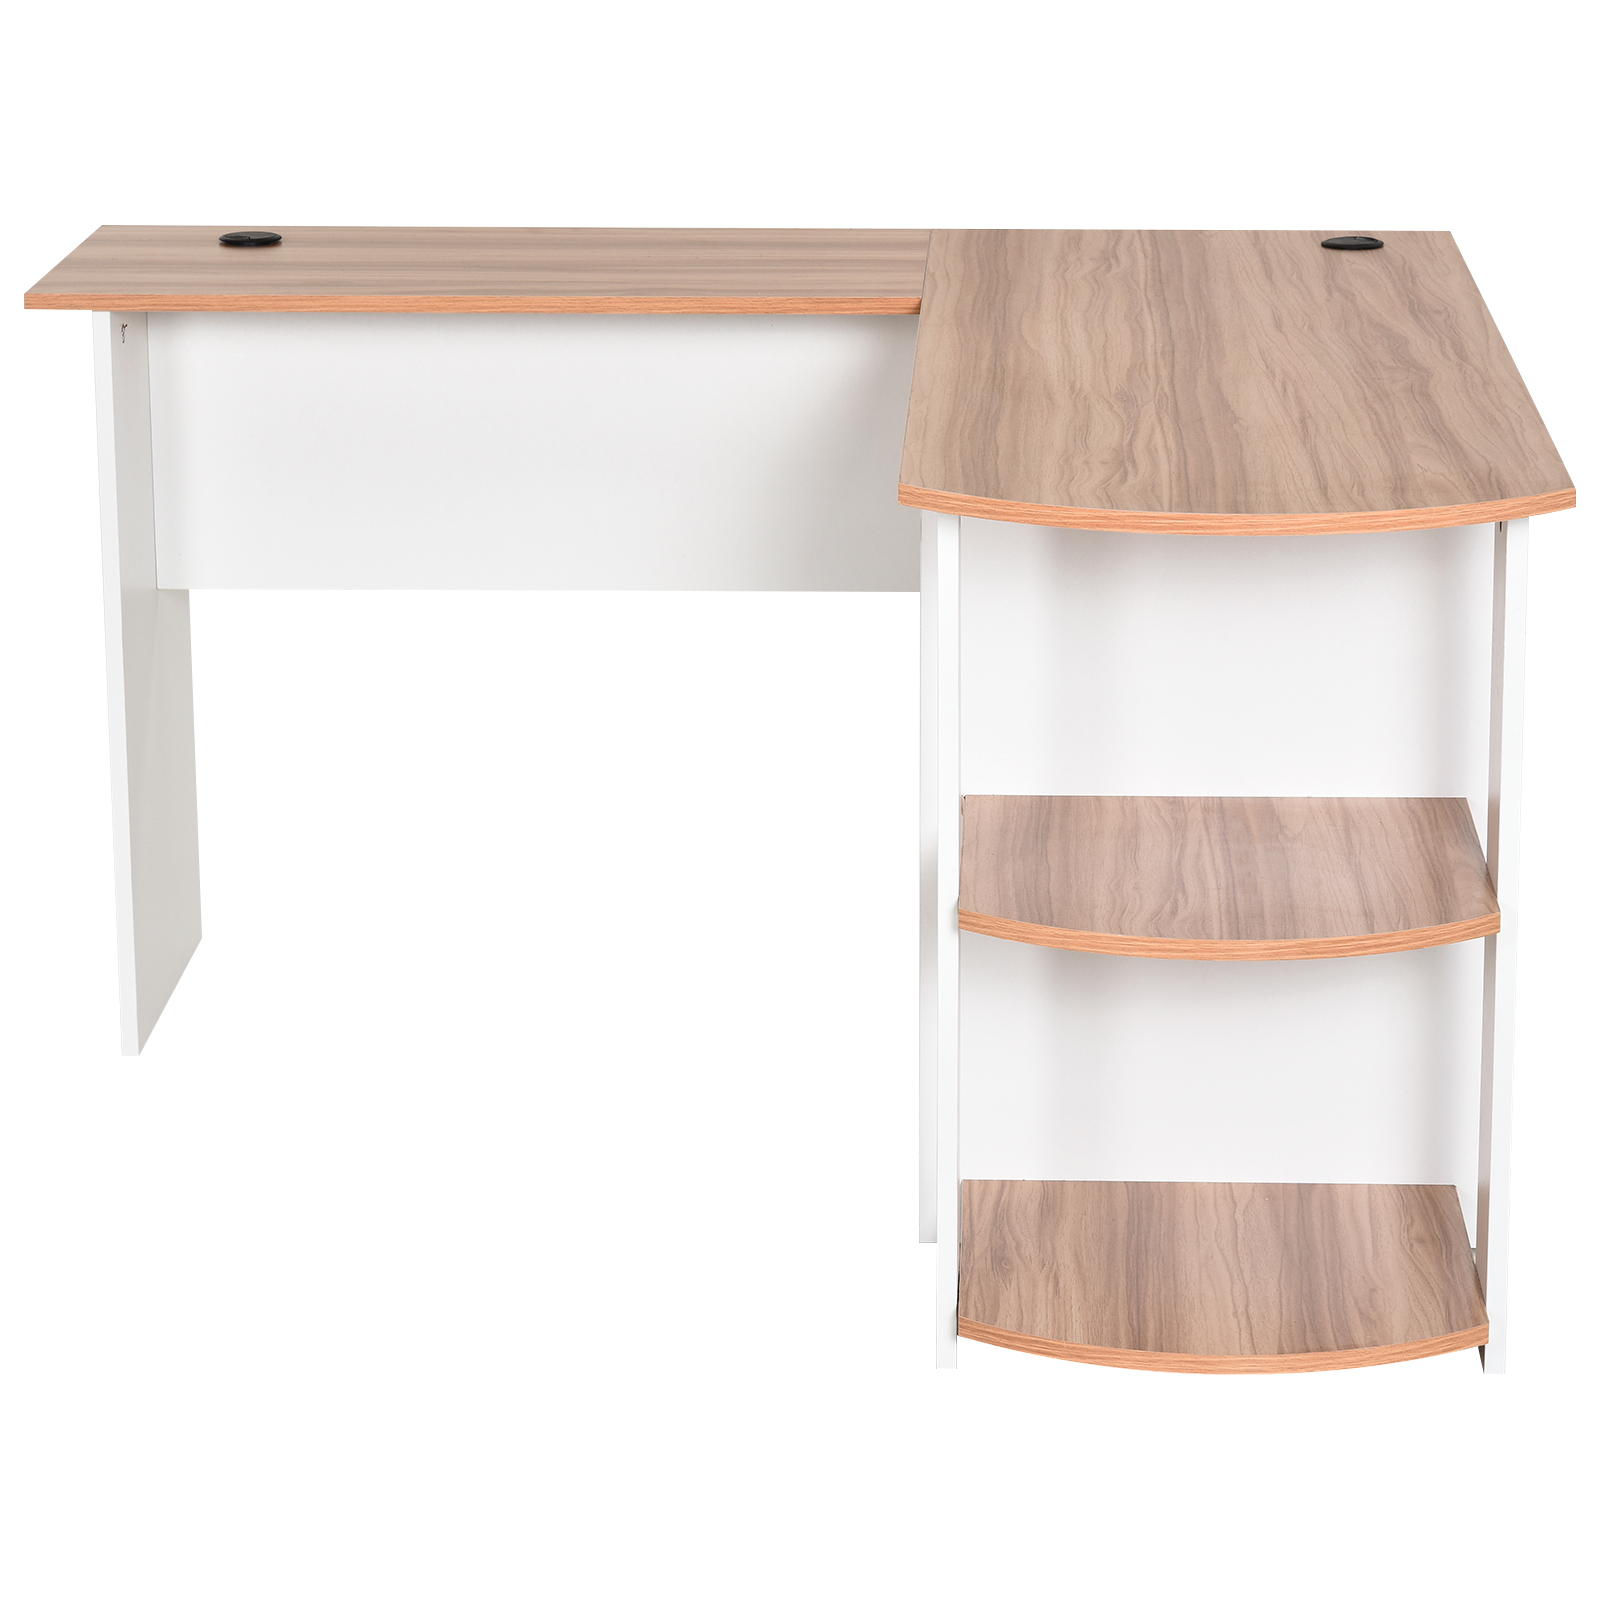 Mesa-de-Ordenador-PC-Escritorio-para-Oficina-Hogar-Esquinera-Forma-L-Madera miniatura 16